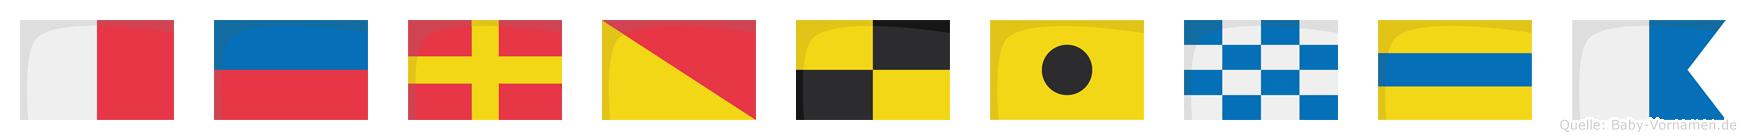 Herolinda im Flaggenalphabet